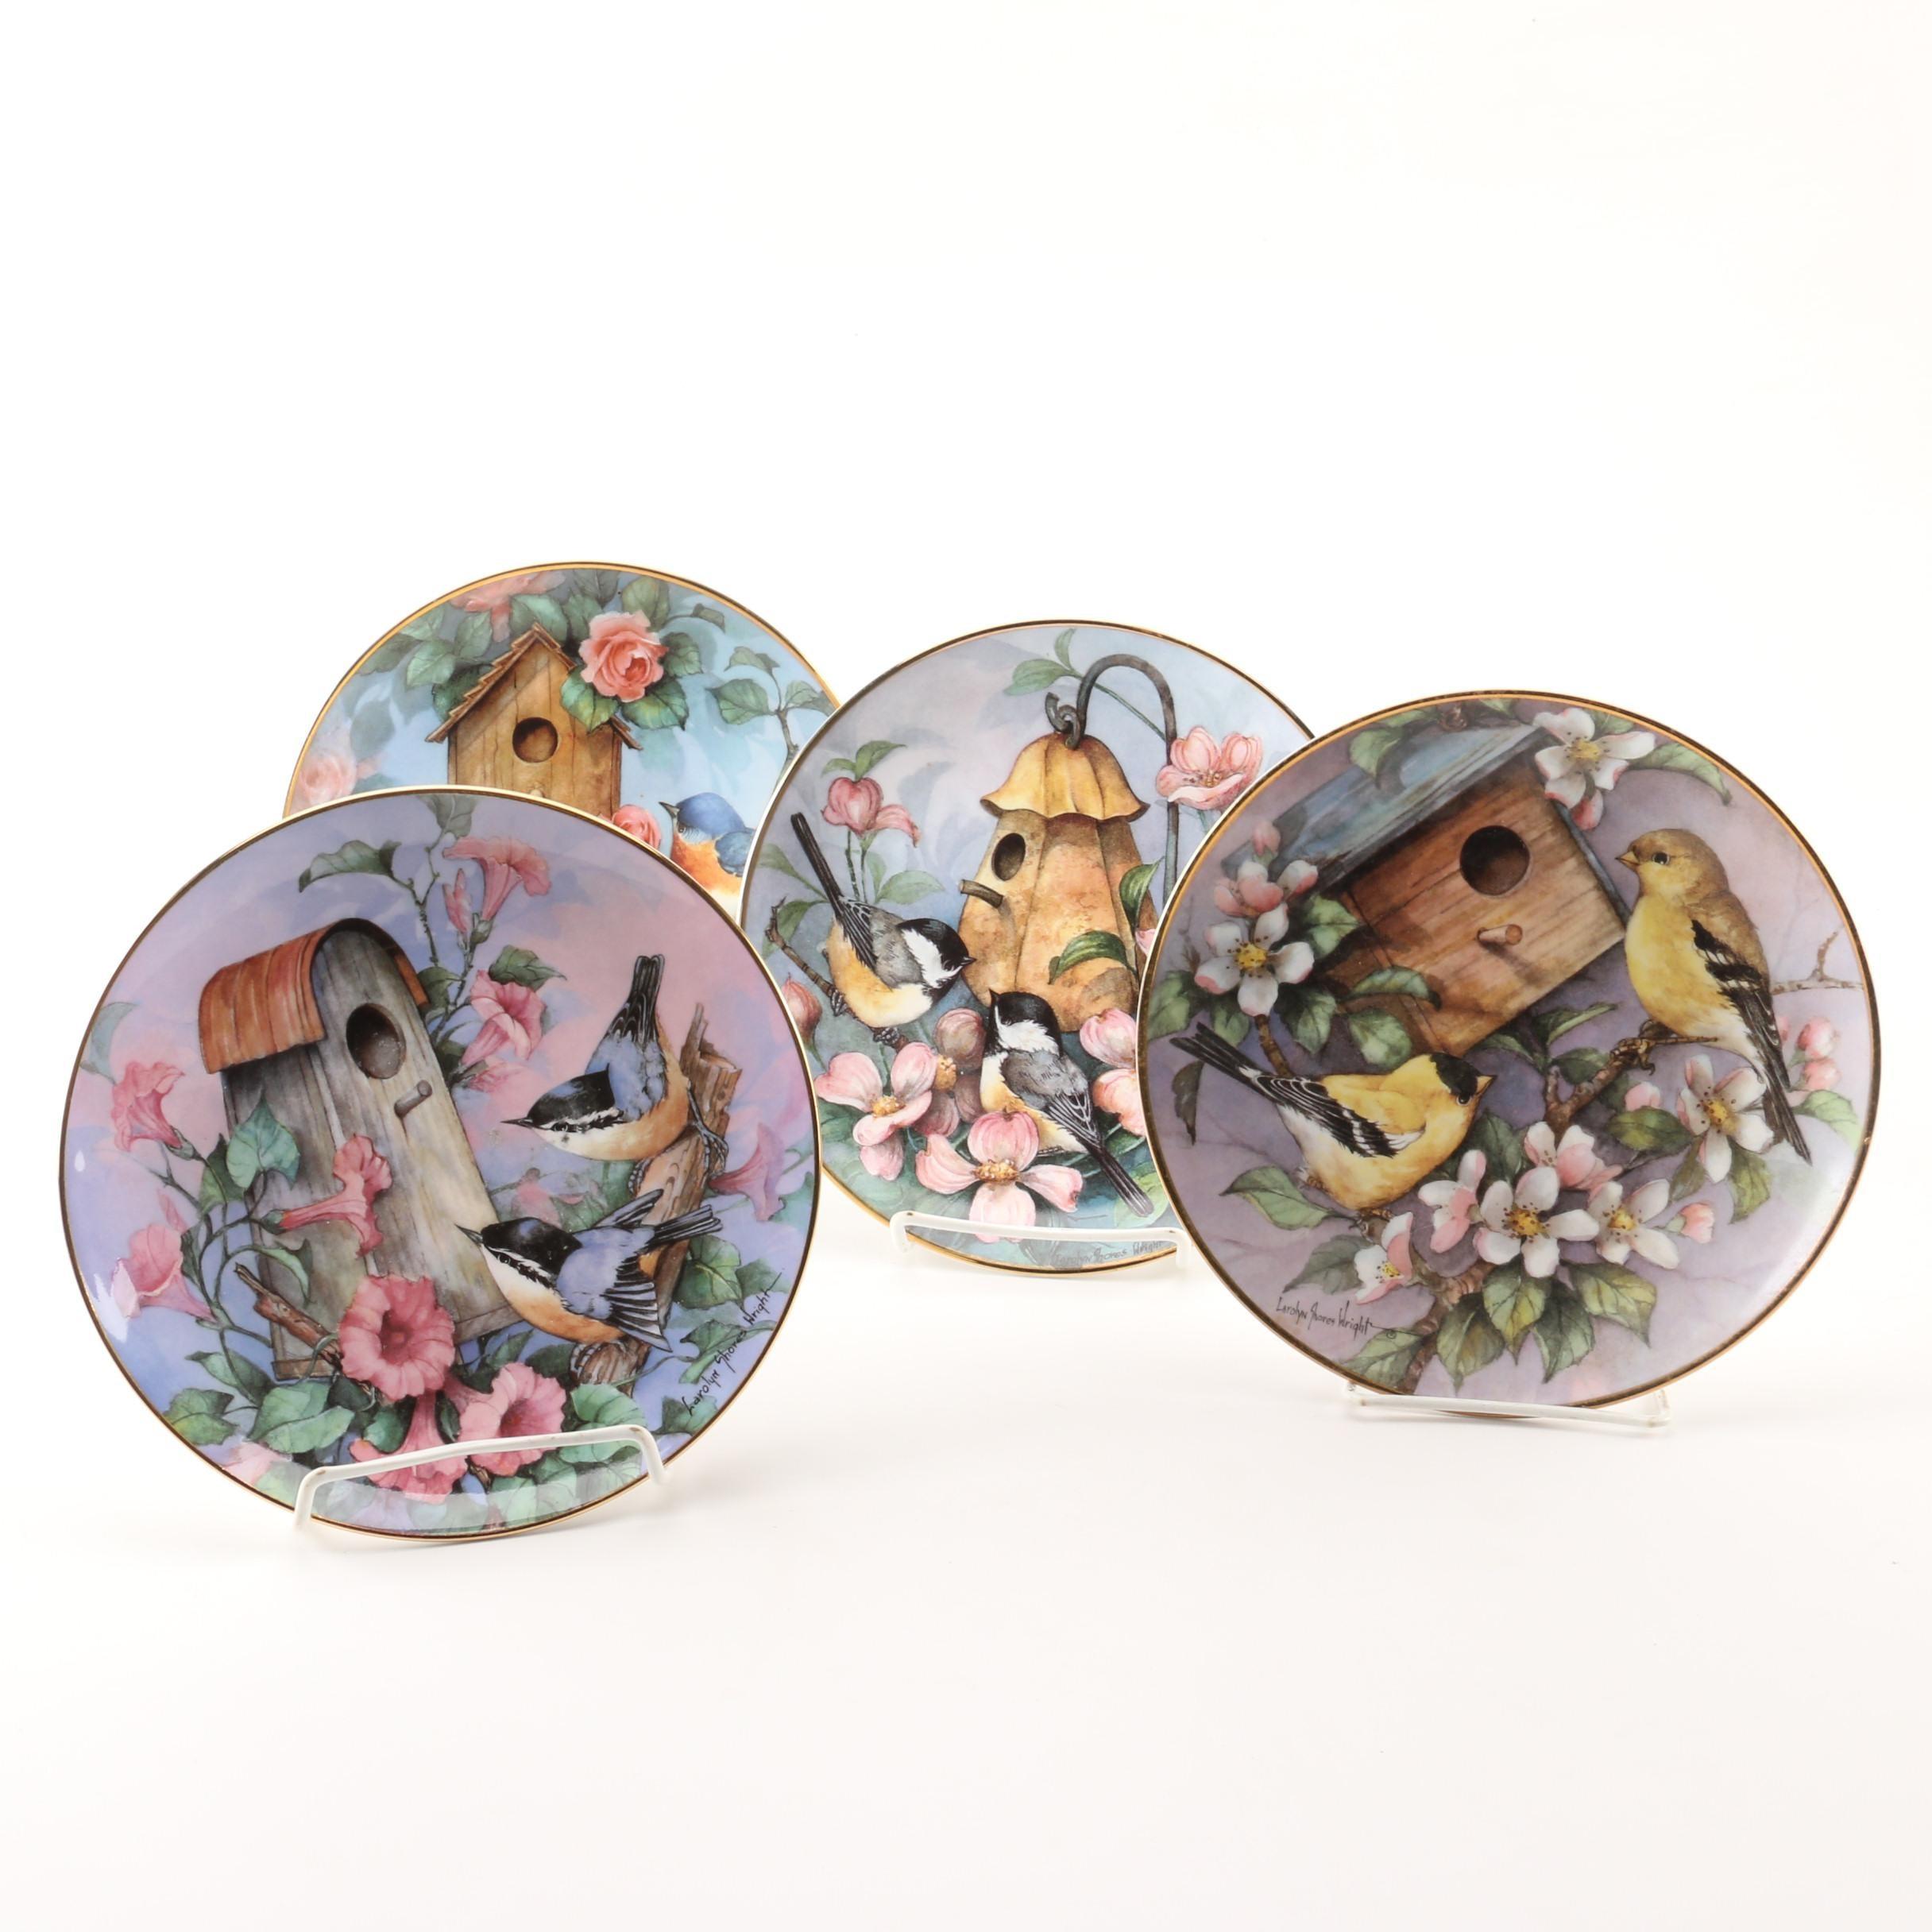 Franklin Mint Royal Doulton Larolyn Shores Wright Birdhouse Collector Plates